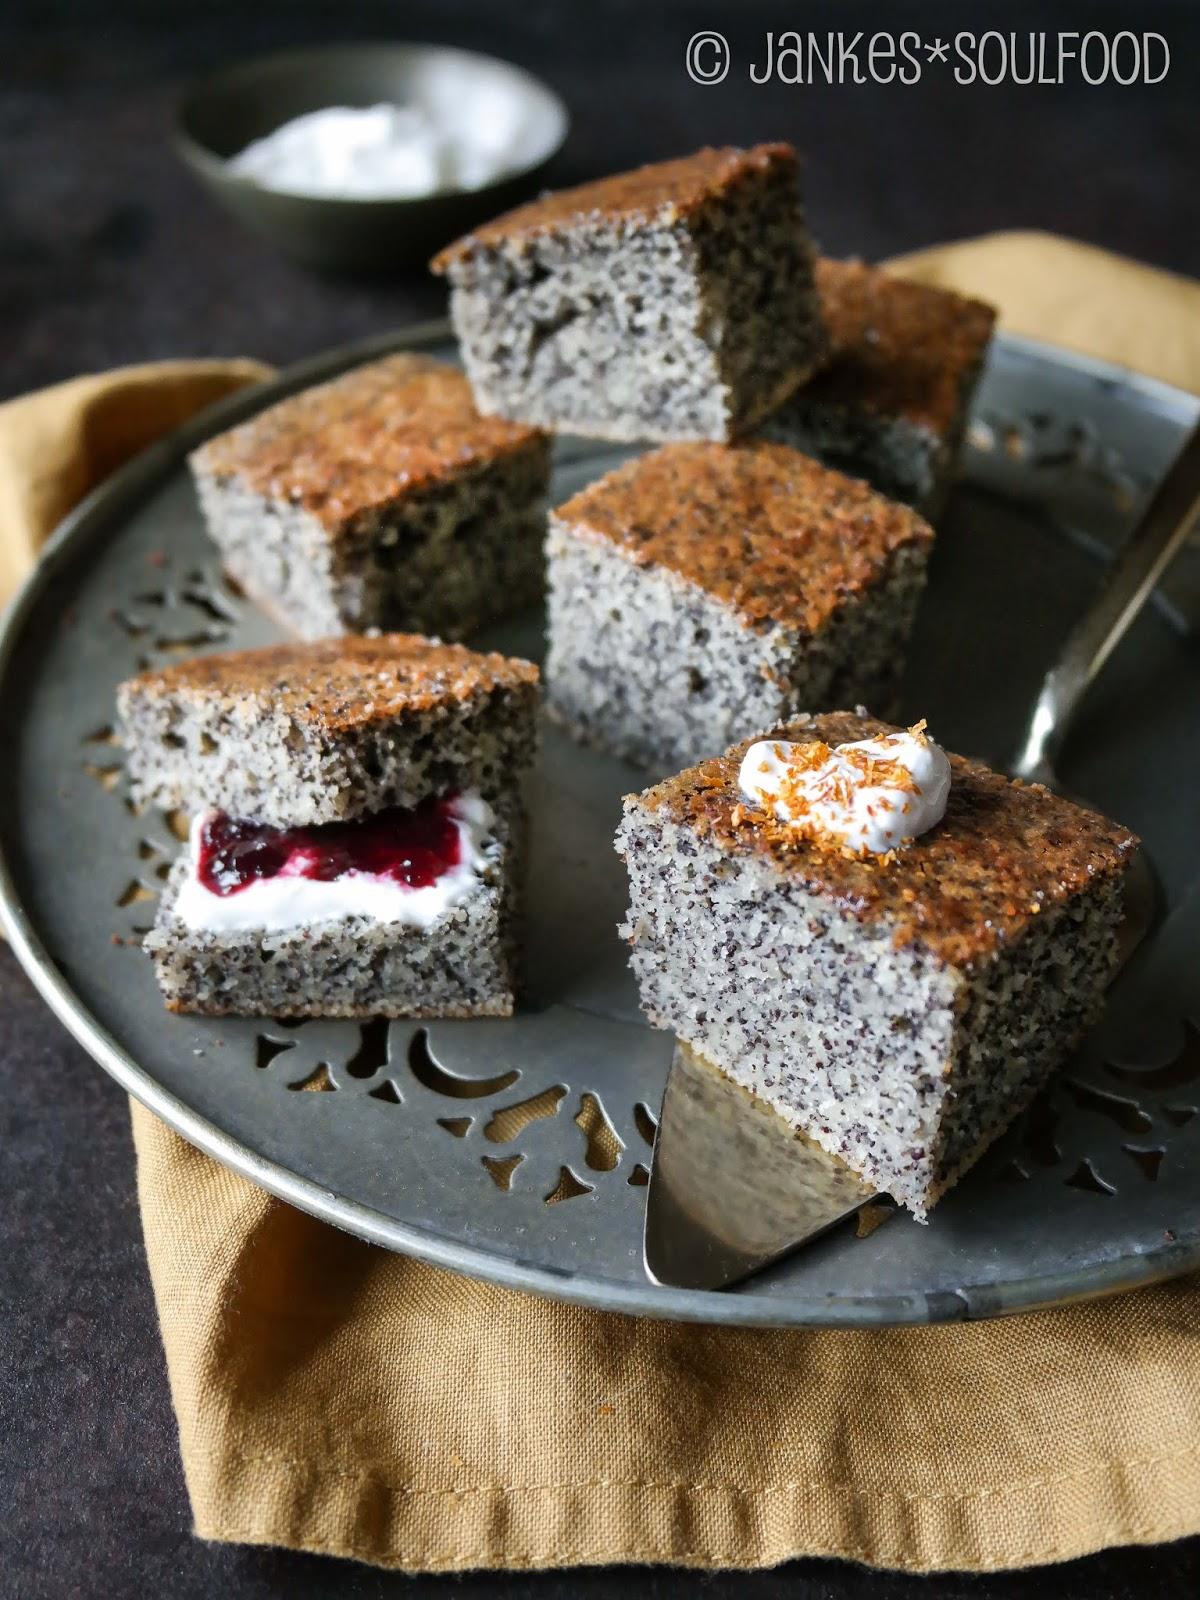 Mohn-Grieß-Kuchen von Jankes Soulfood